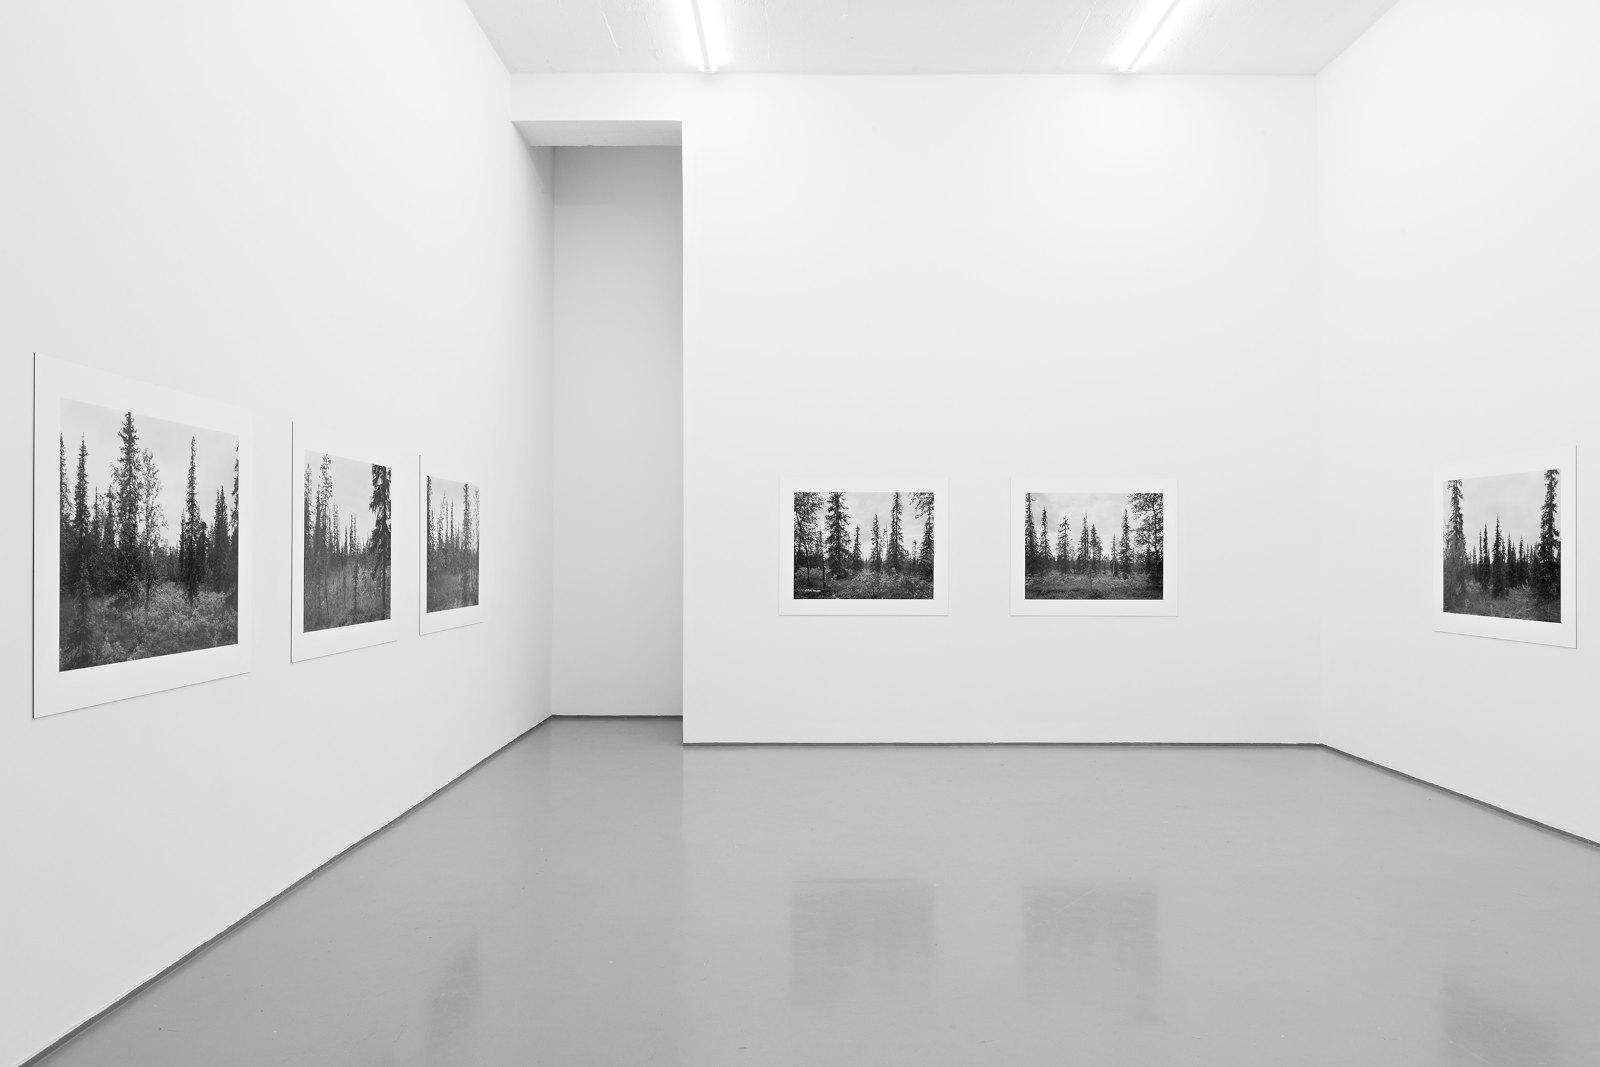 Installation view, Per Berntsen, Metsä - new landscapes, Galleri Riis, Oslo, 2013